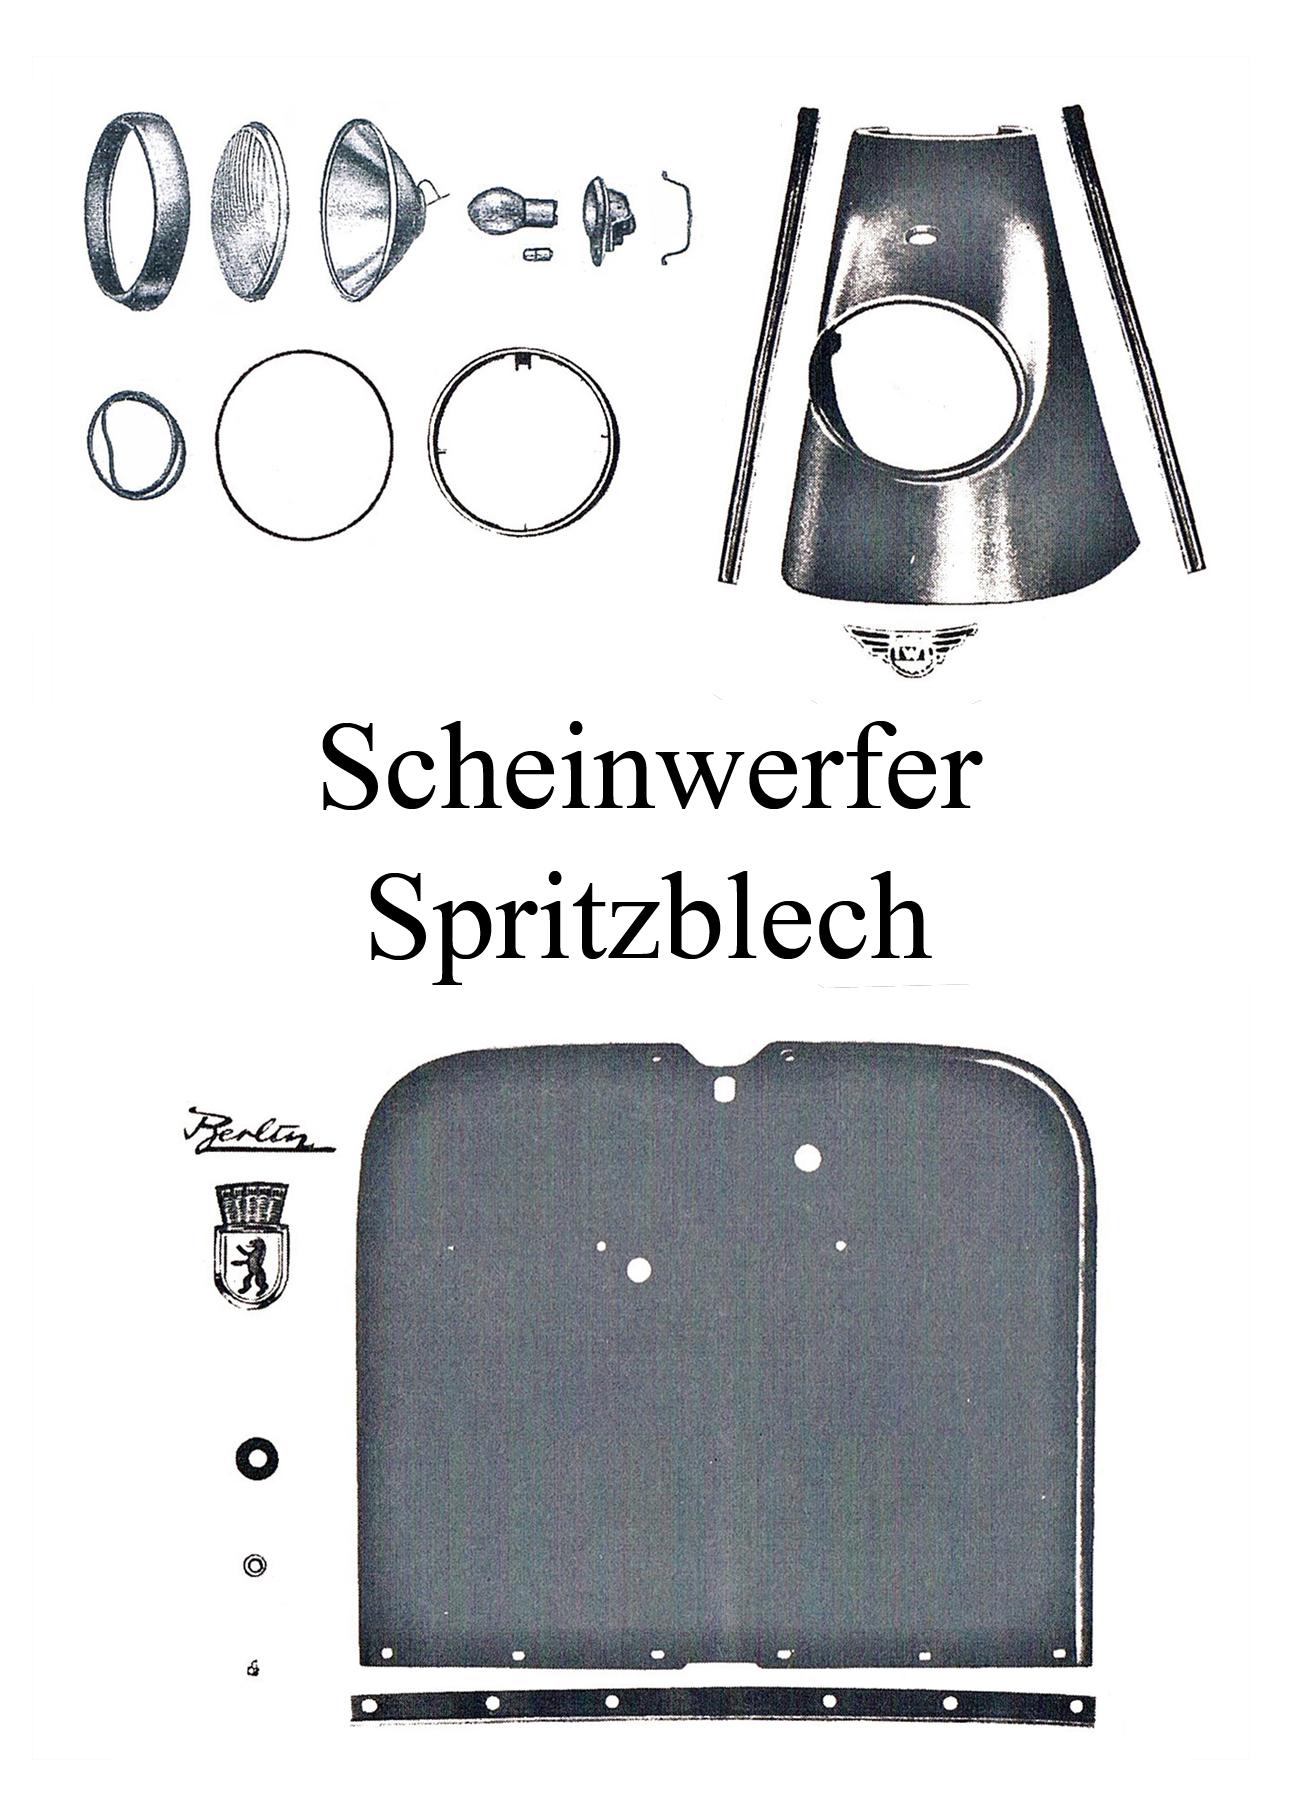 DDR-Motorrad IWL Berliner Roller SR 59 Ersatzteileliste Scheinwerfer Spritzblech Reflekor Lampenring Kedergummi Emblem Blende